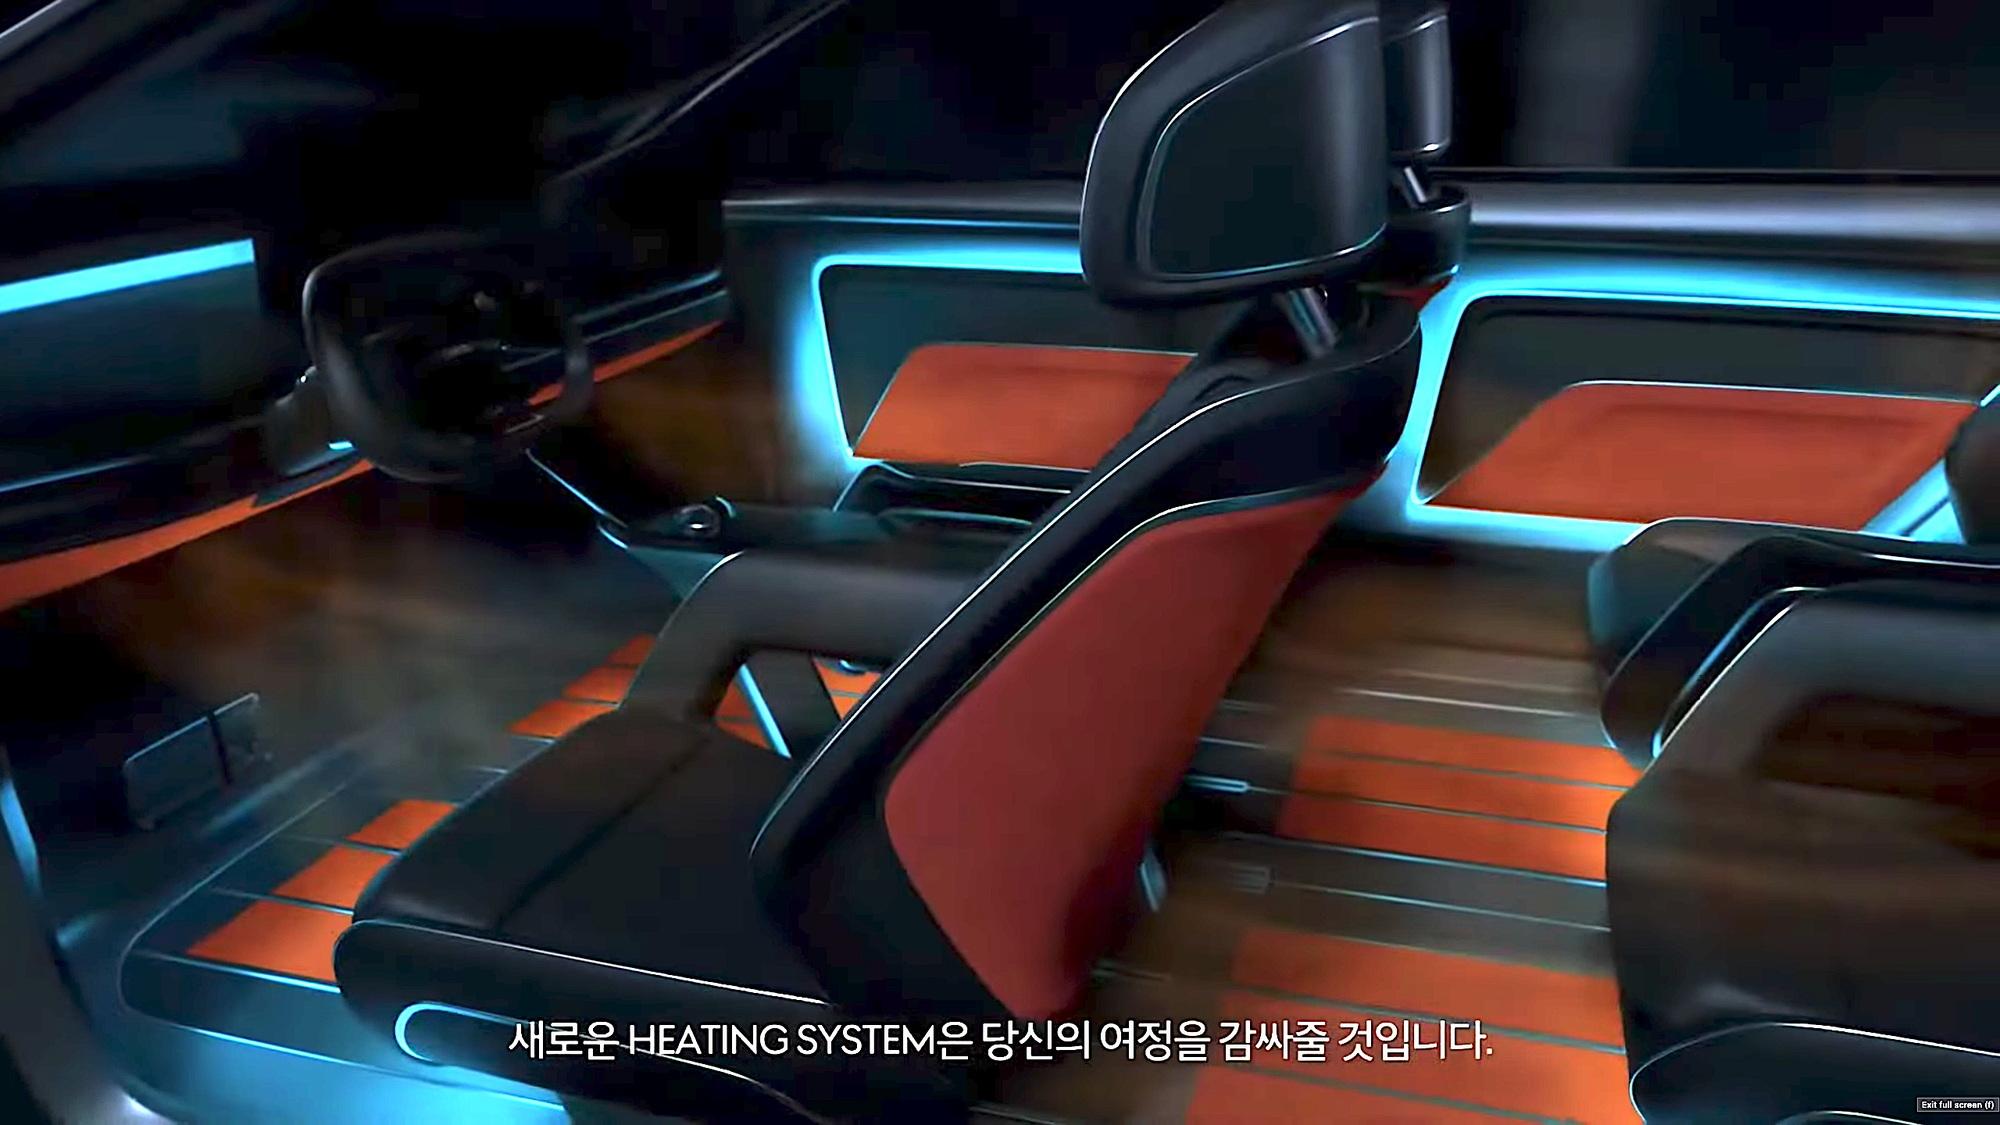 Genesis future innovative heating system  -  September 2021